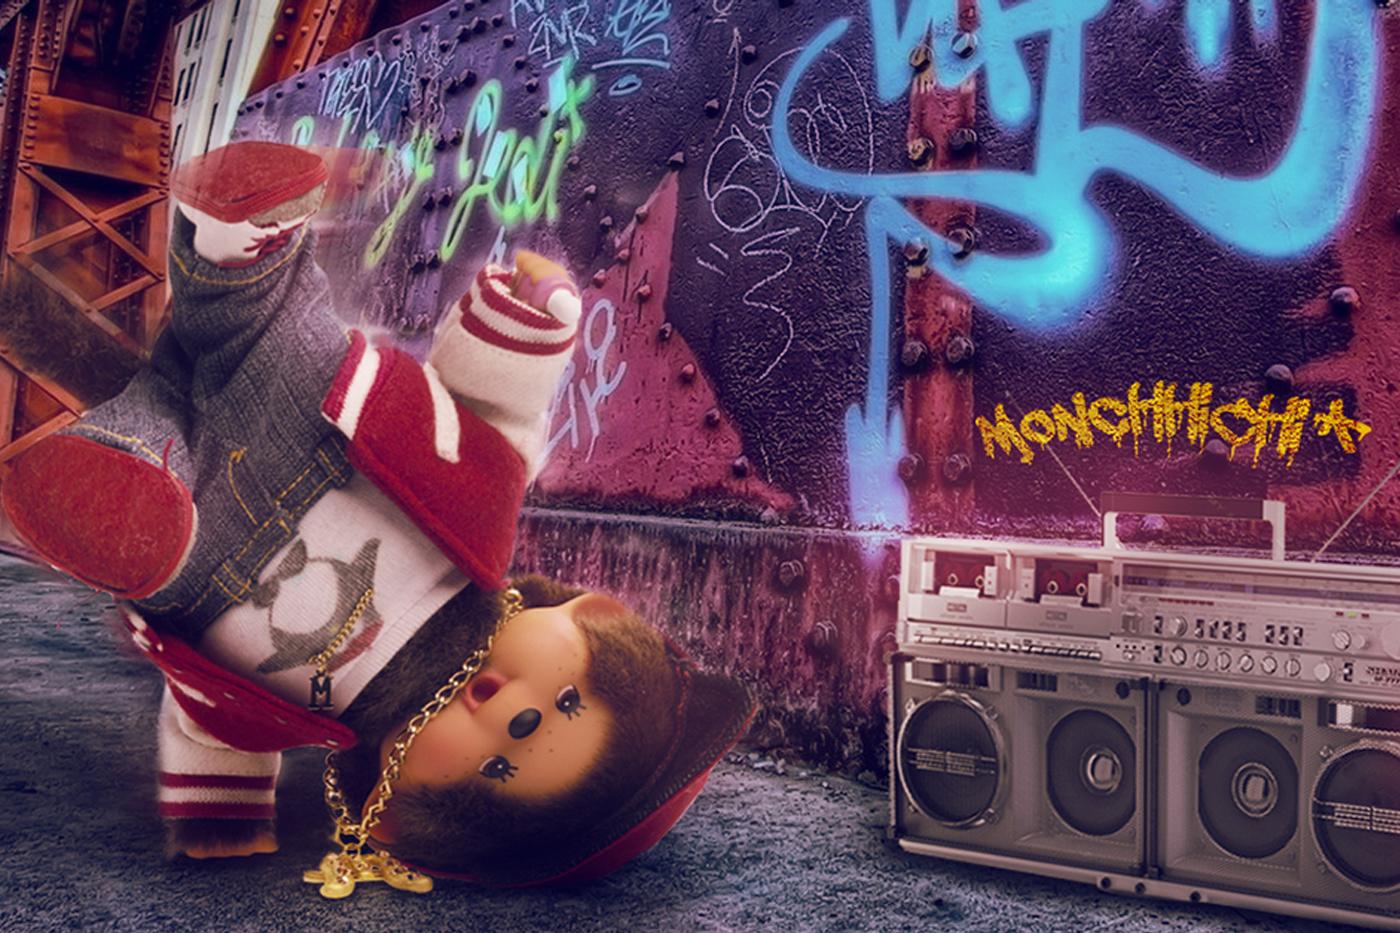 hiphopkiki